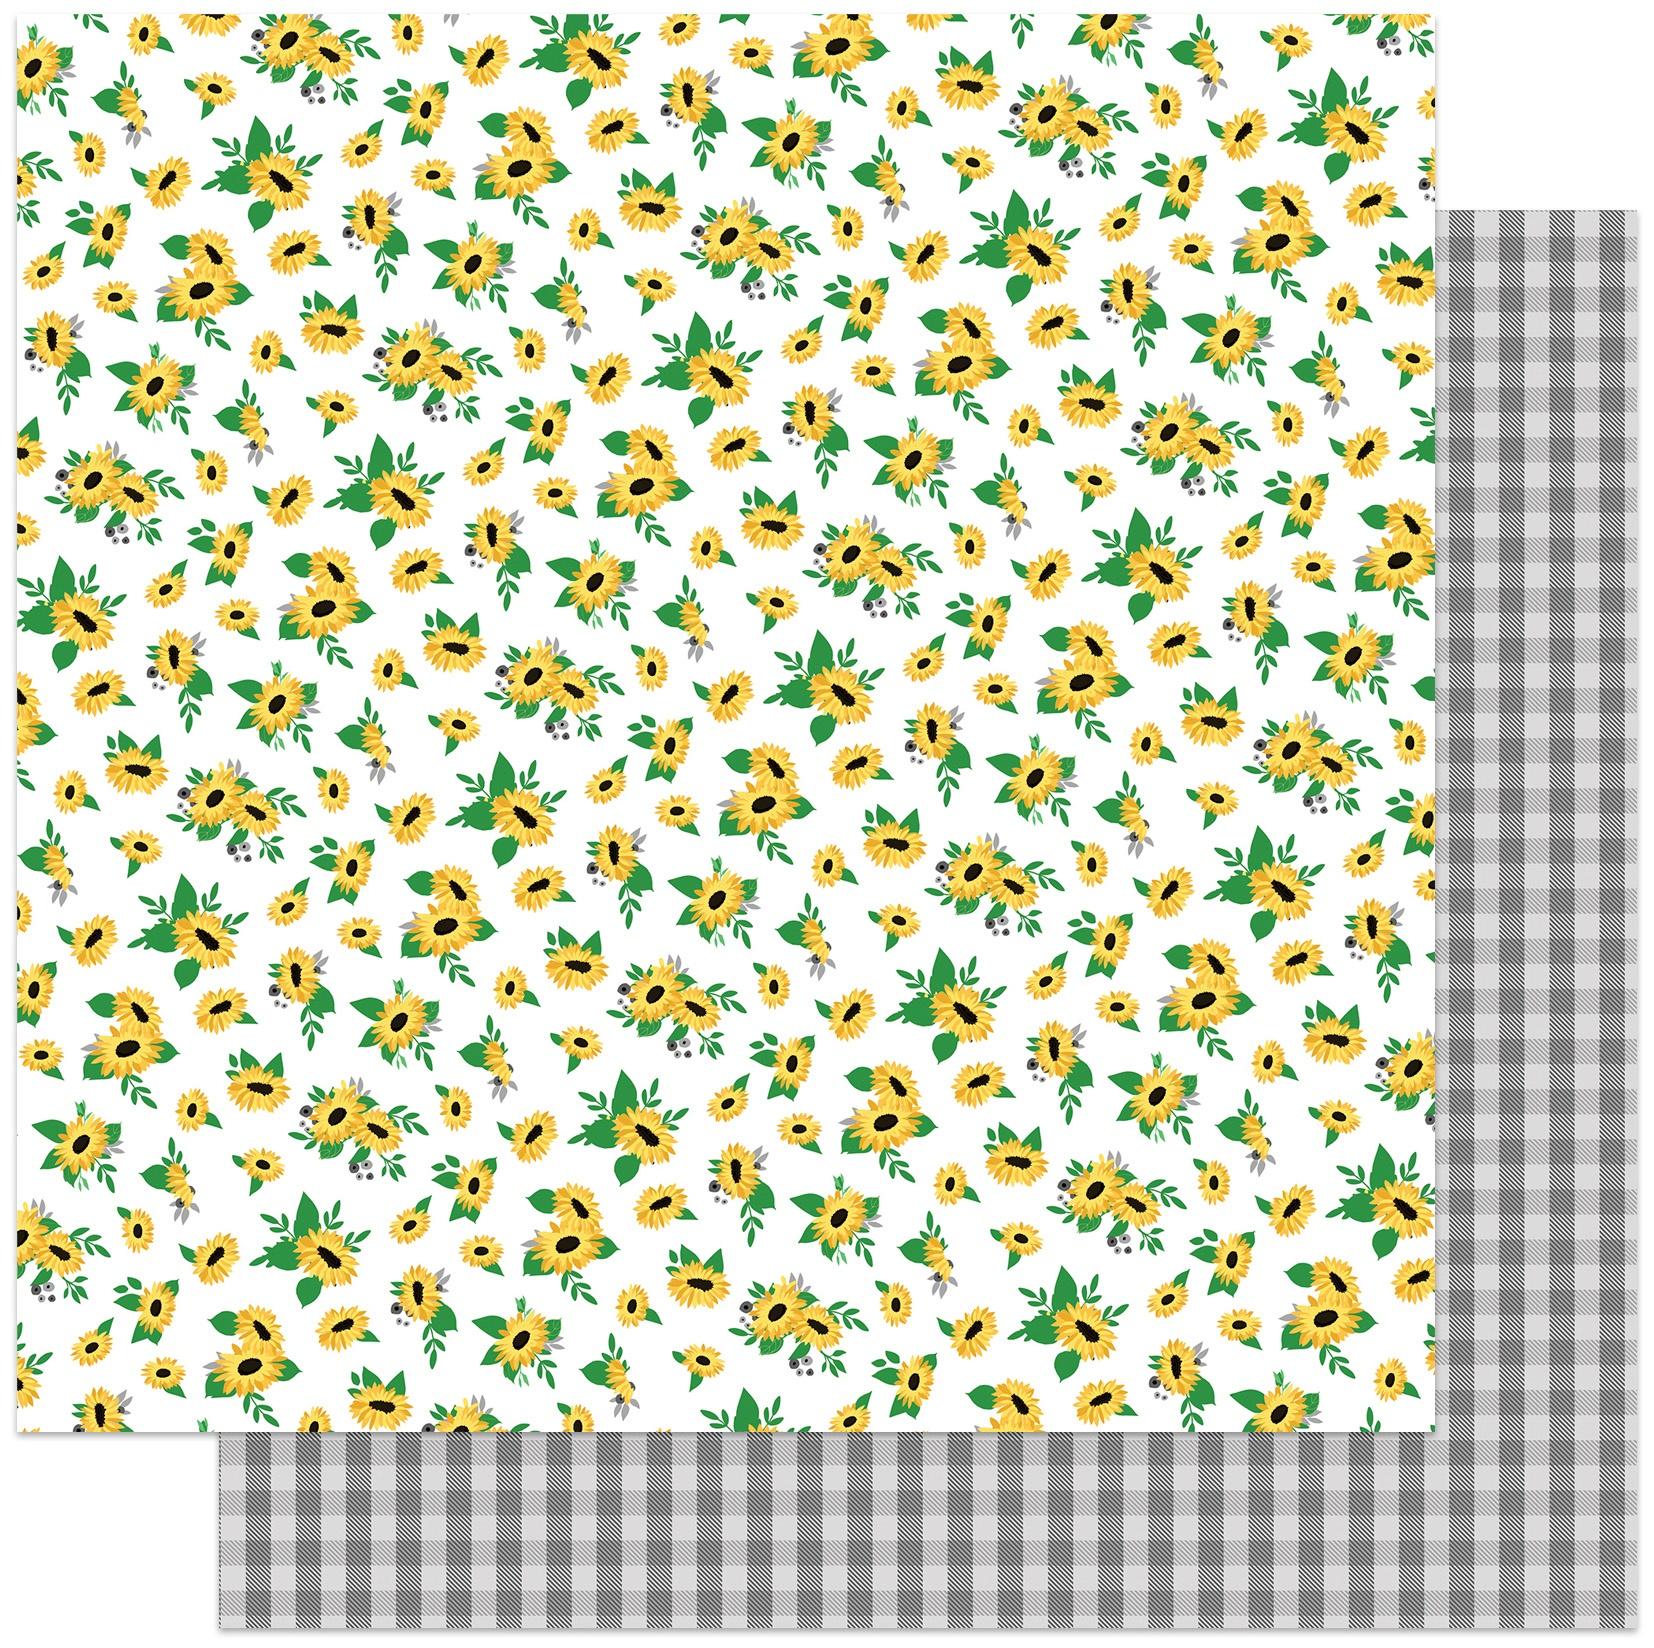 PPL Sweet as Honey - Sunflowers